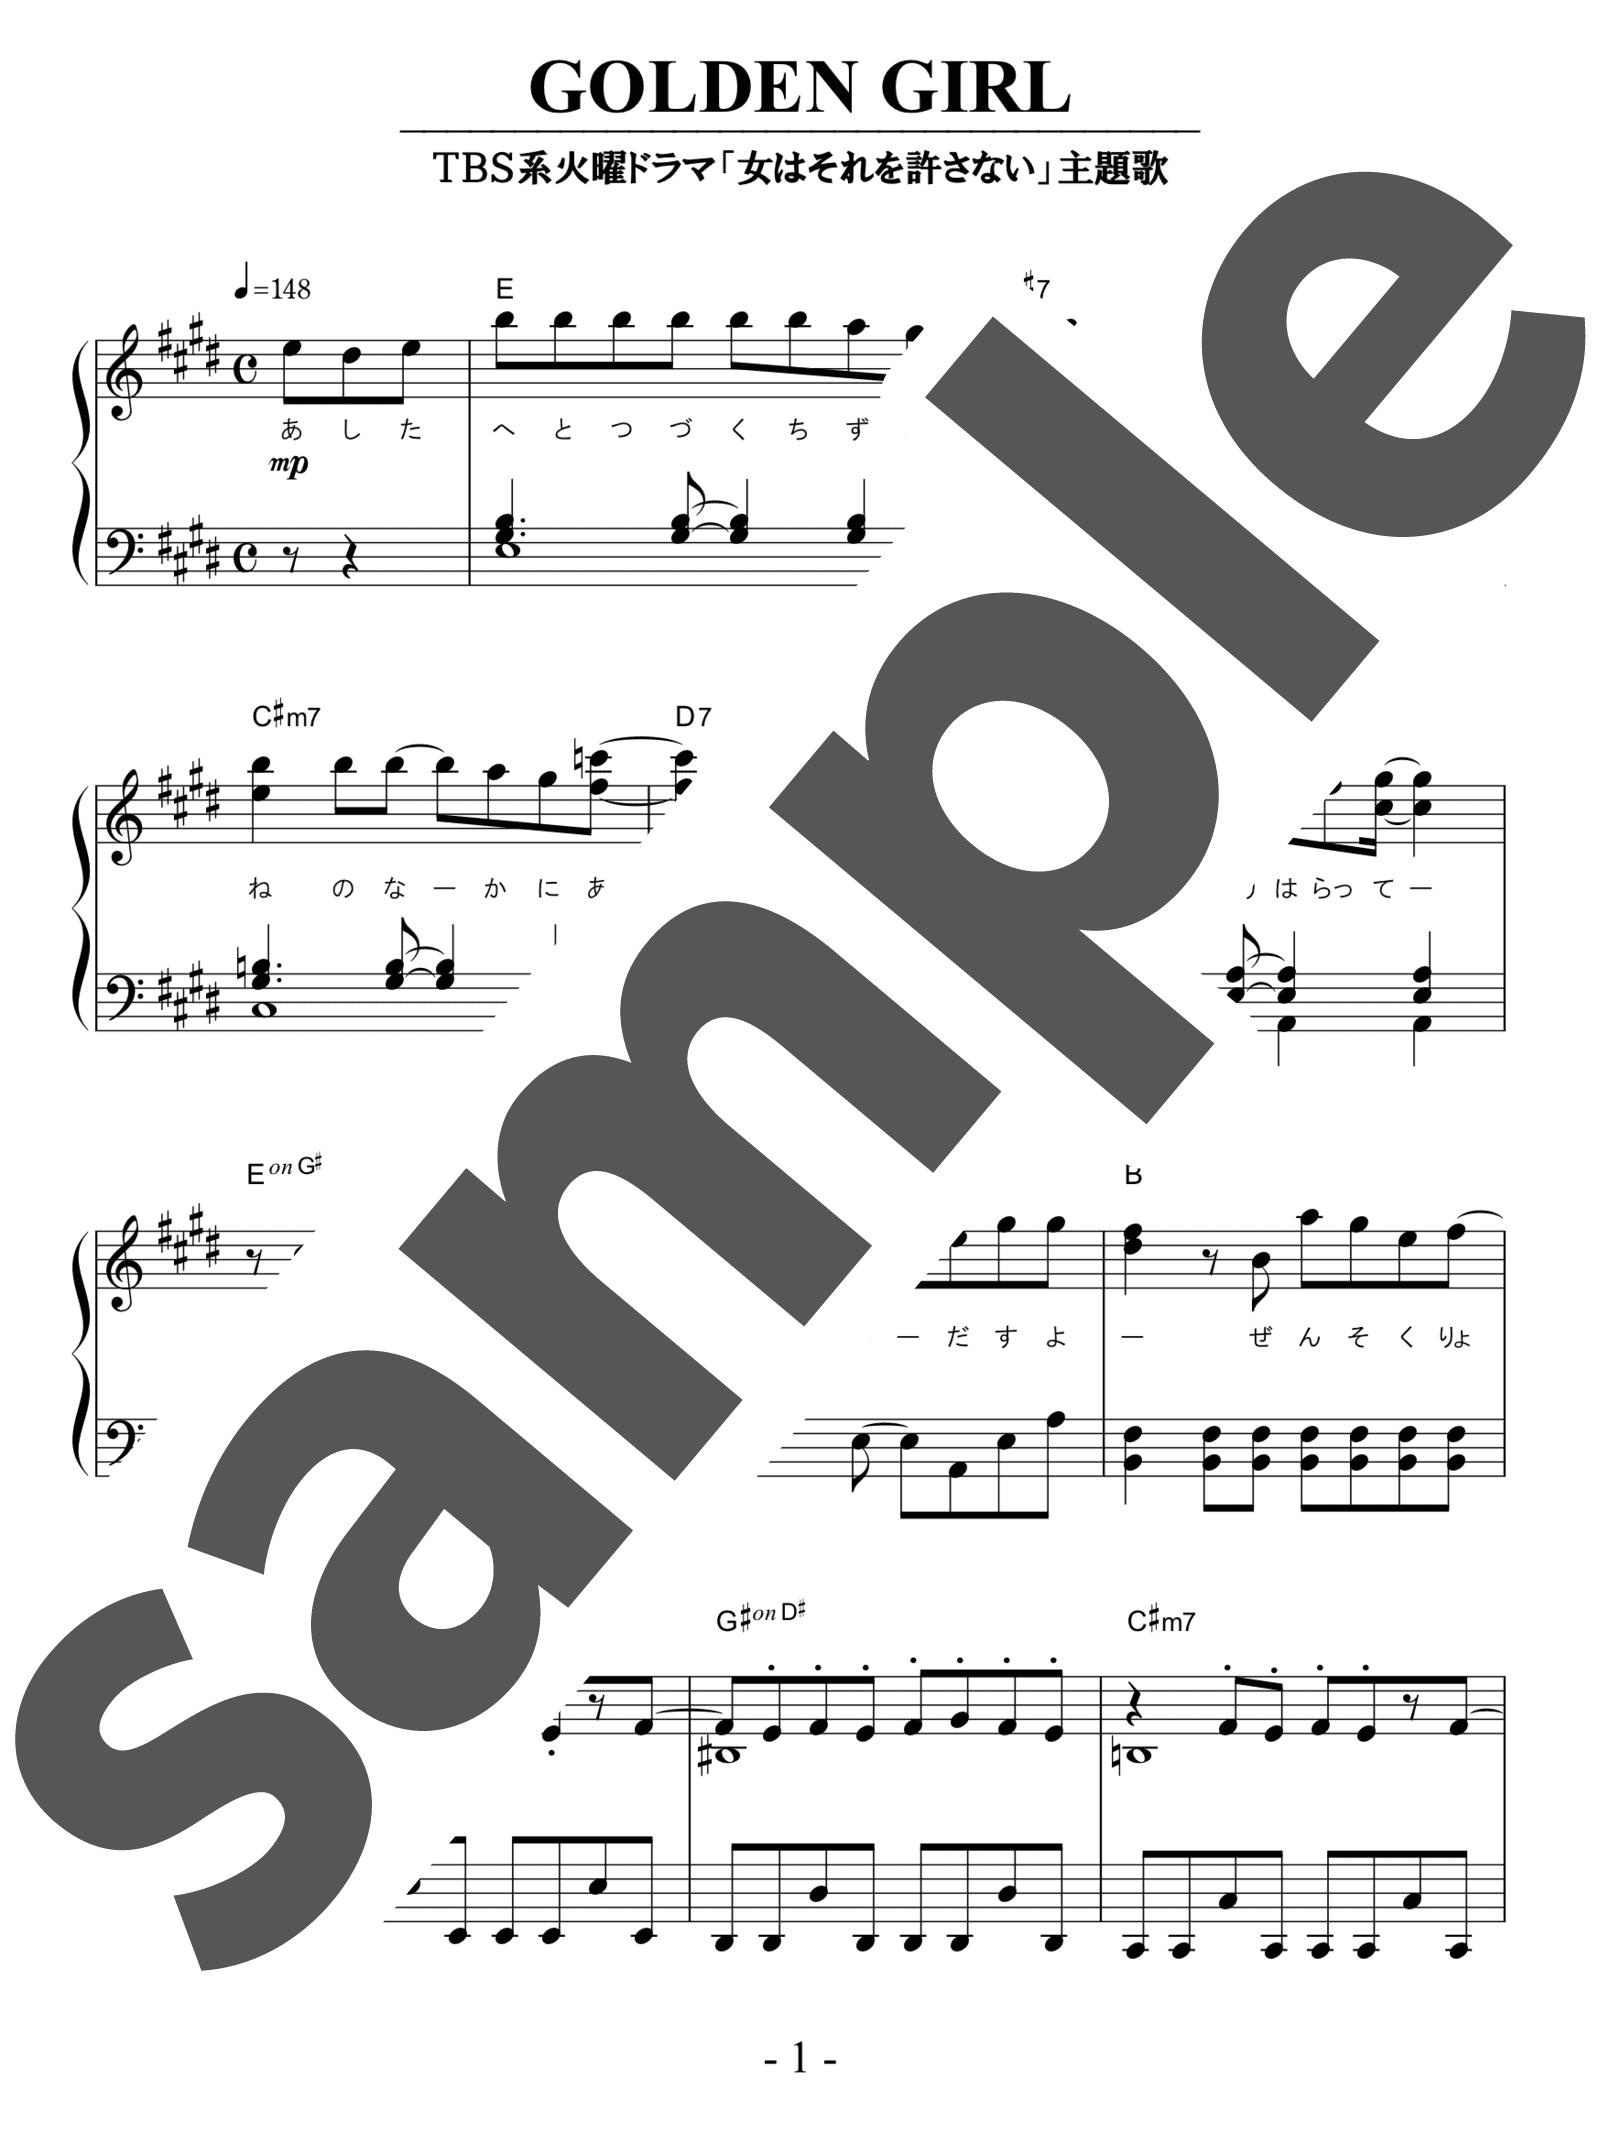 「GOLDEN GIRL」のサンプル楽譜